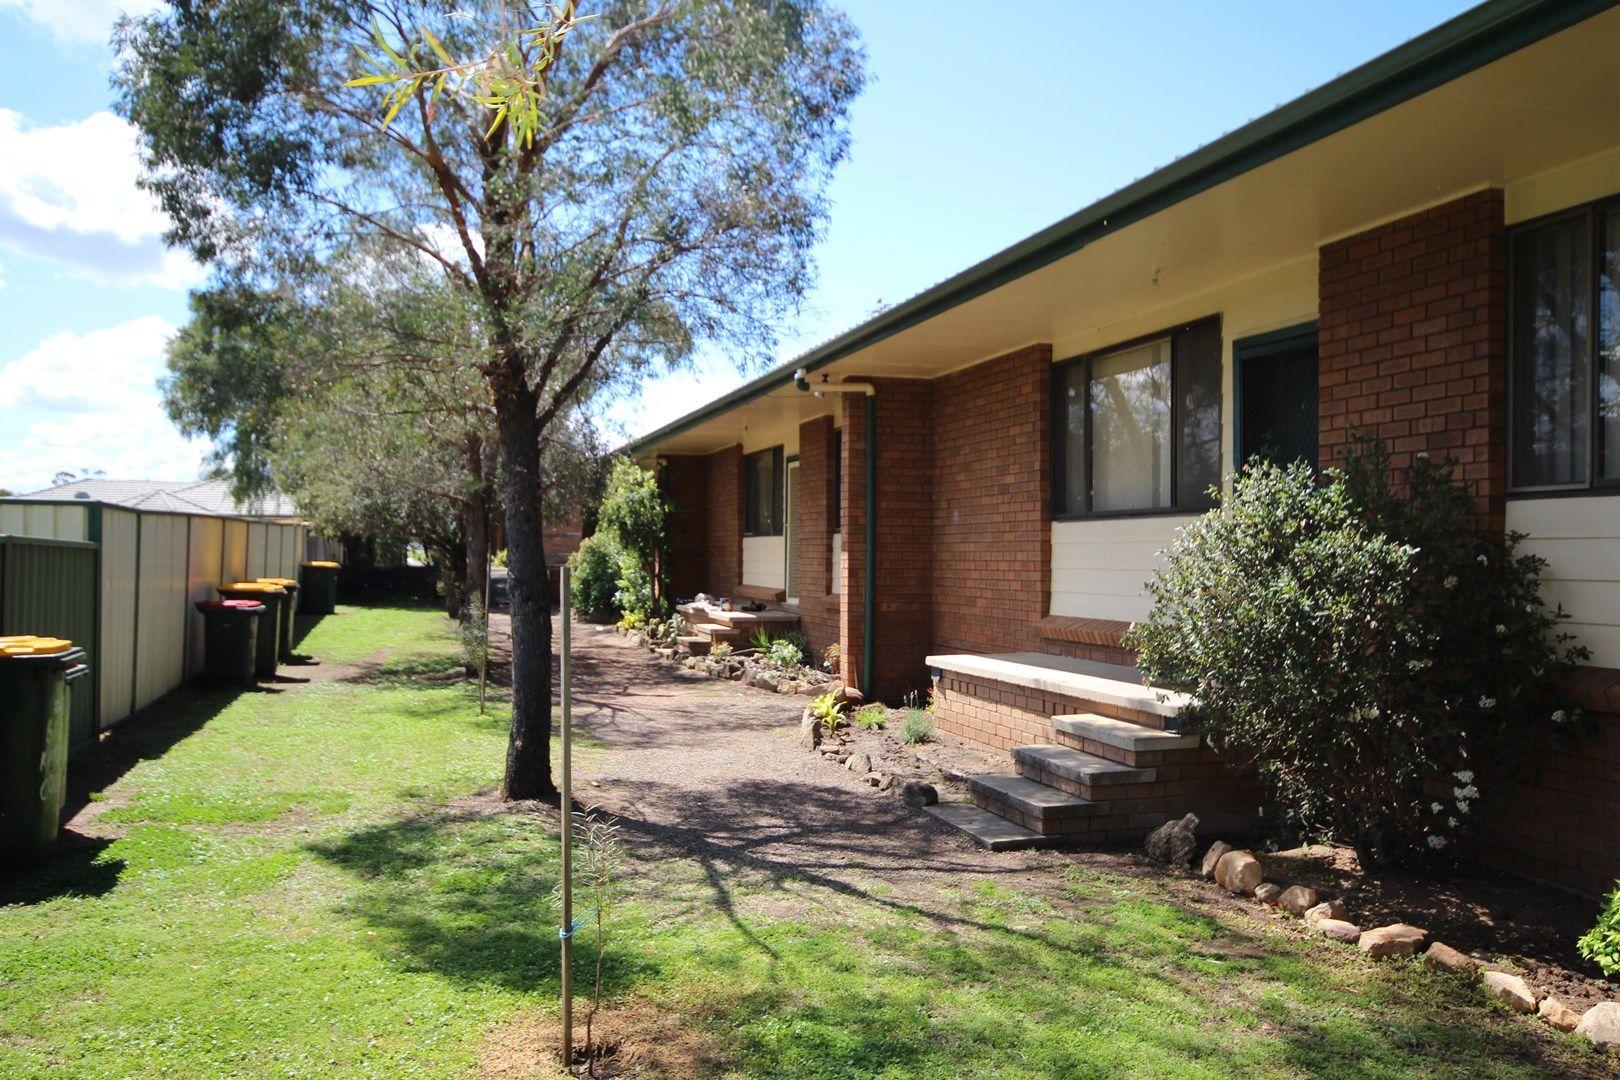 4/11 Kenilworth Street, Denman NSW 2328, Image 0